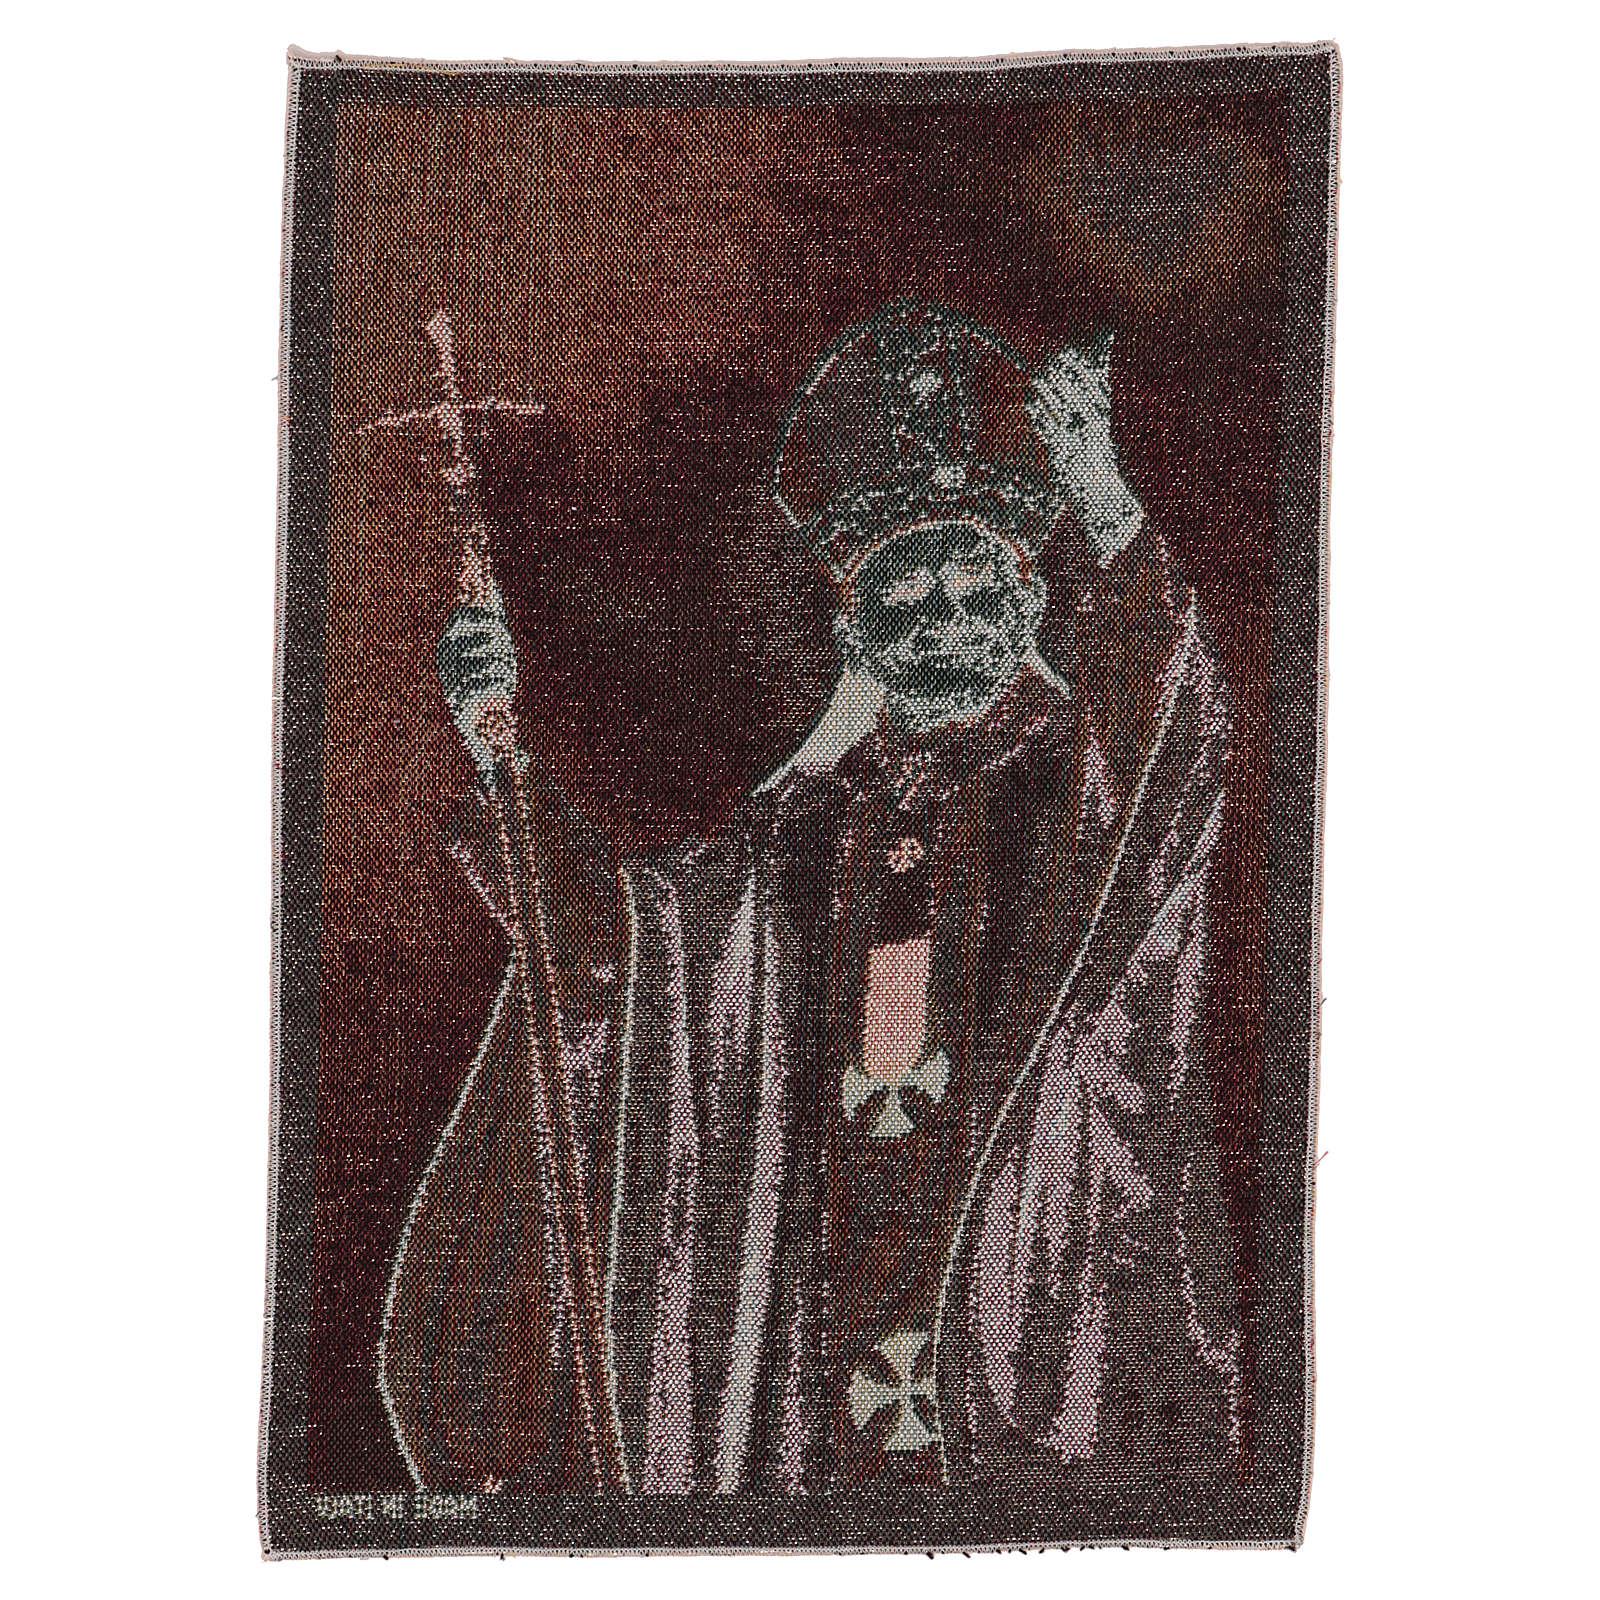 Pope John Paul II with crosier tapestry 16x12